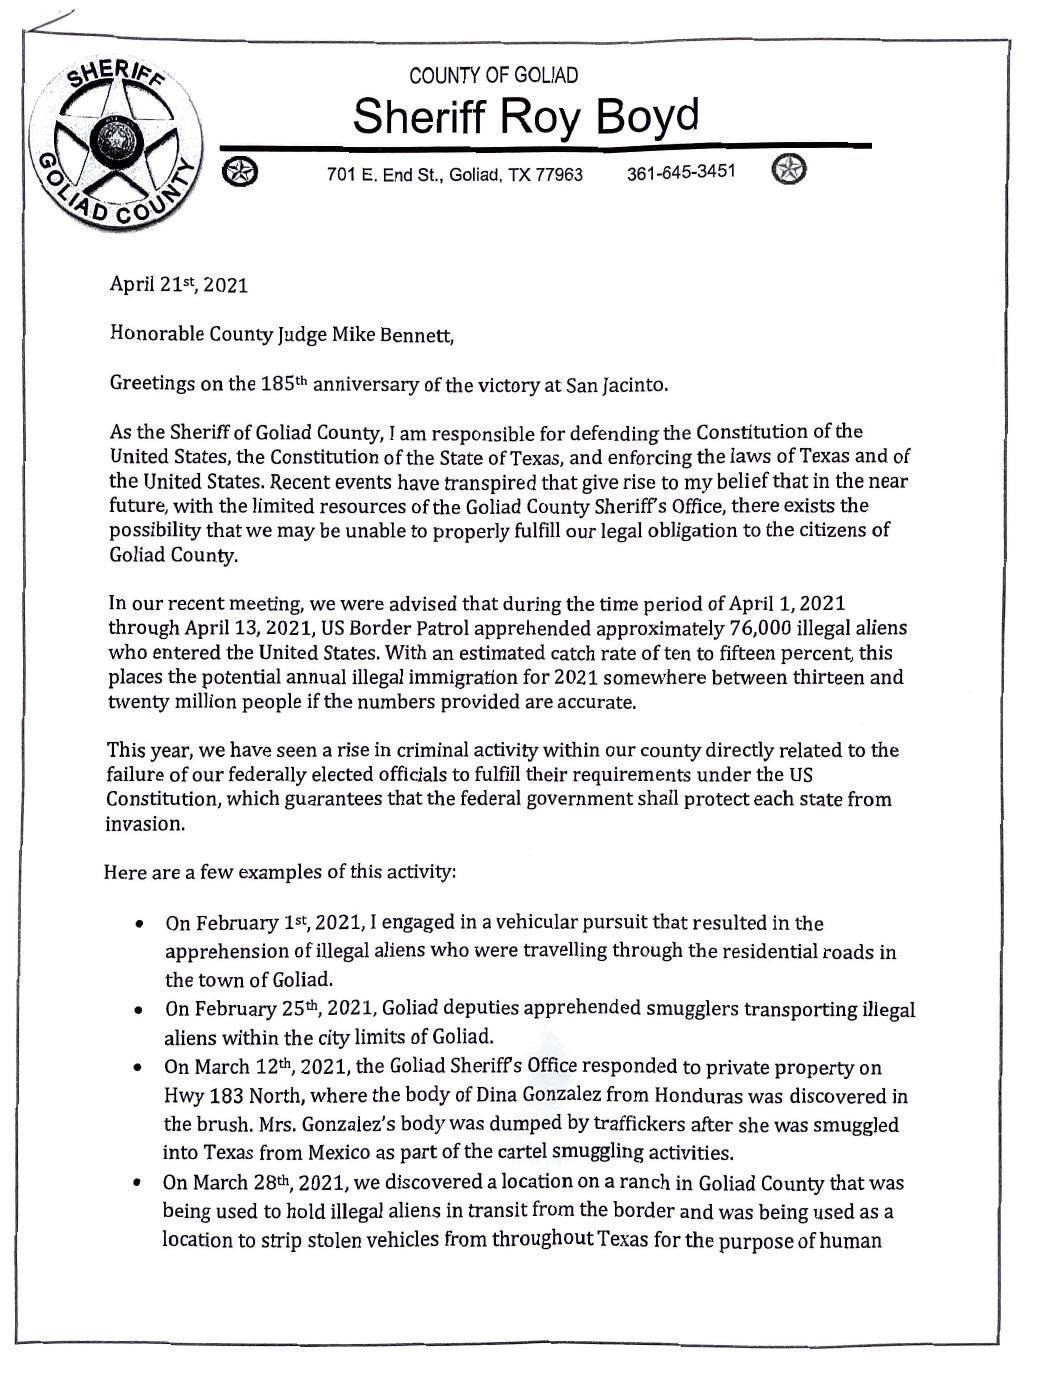 Goliad County Sheriff Letter